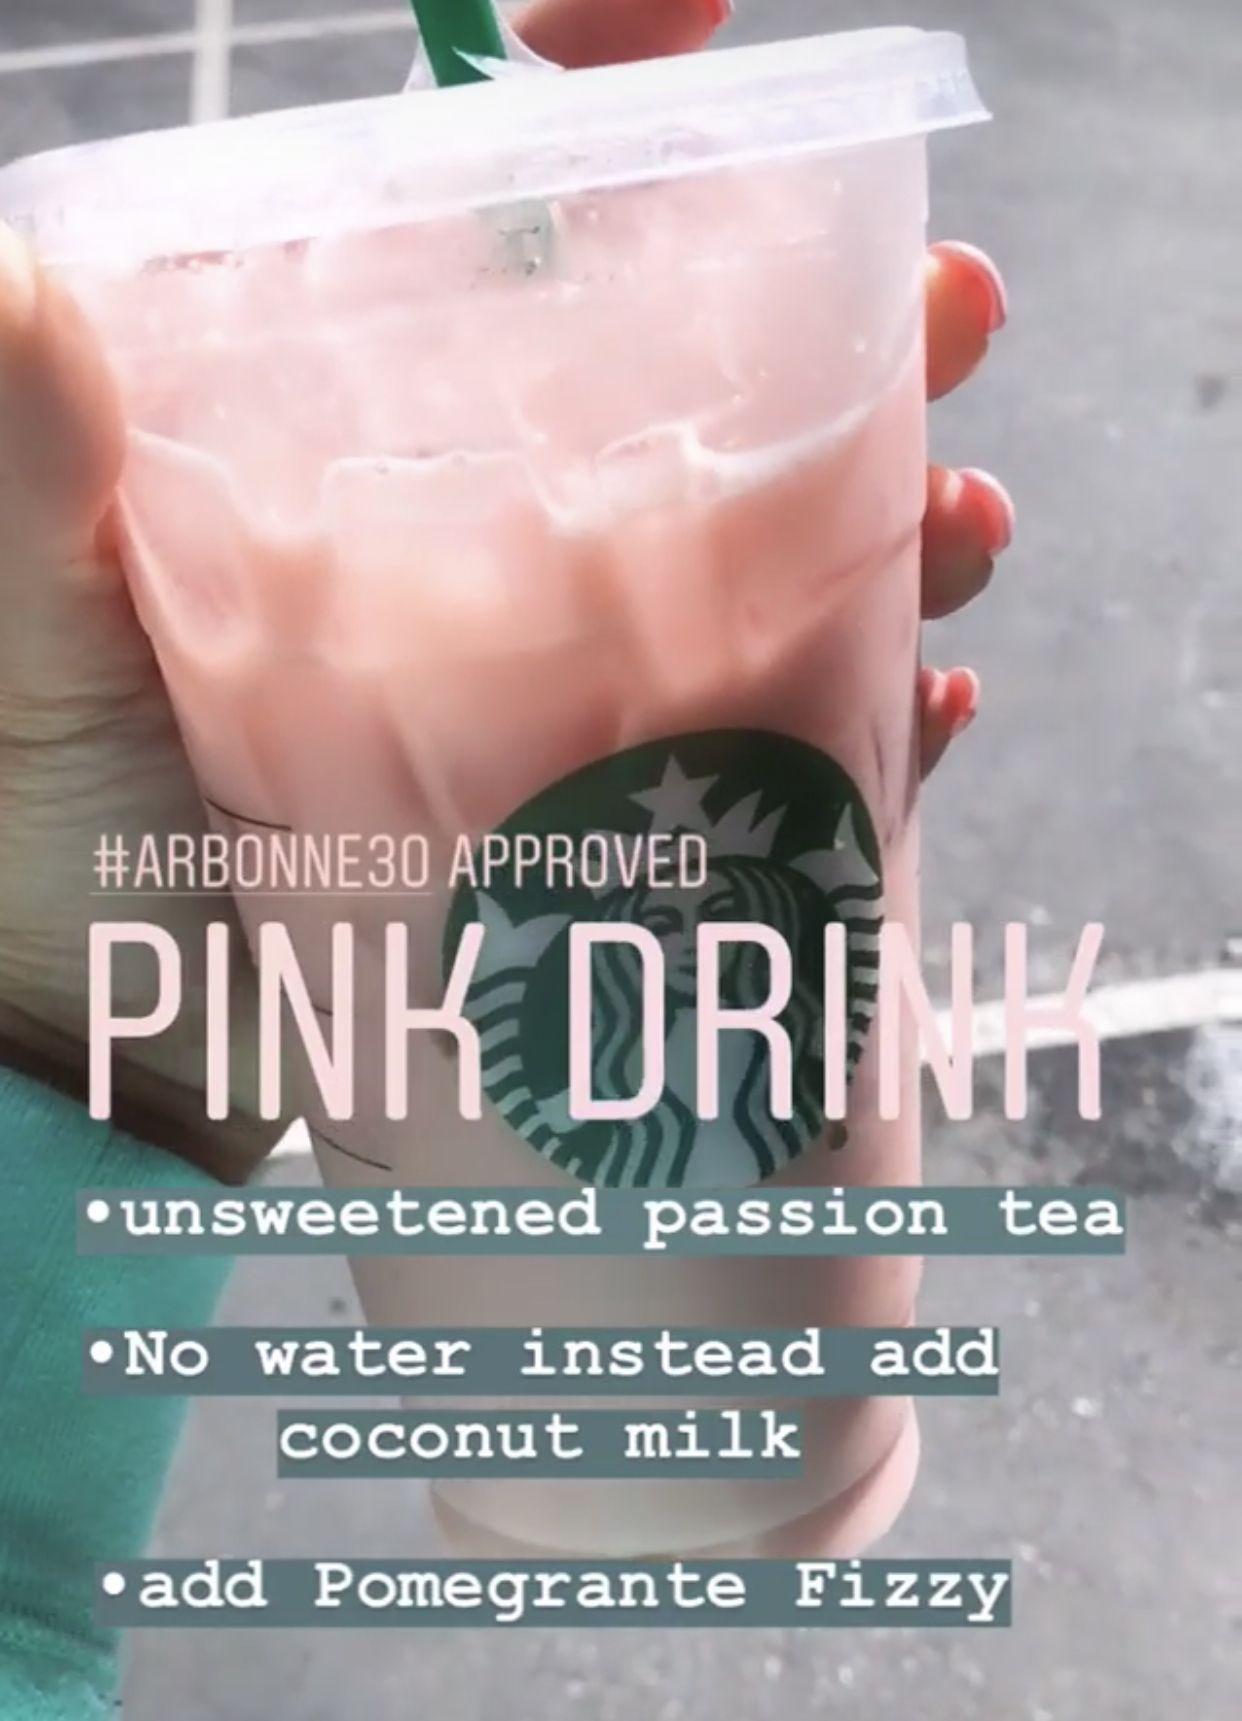 Arbonne Pink Drink Arbonne Detox Recipes Arbonne Shake Recipes Arbonne Recipes